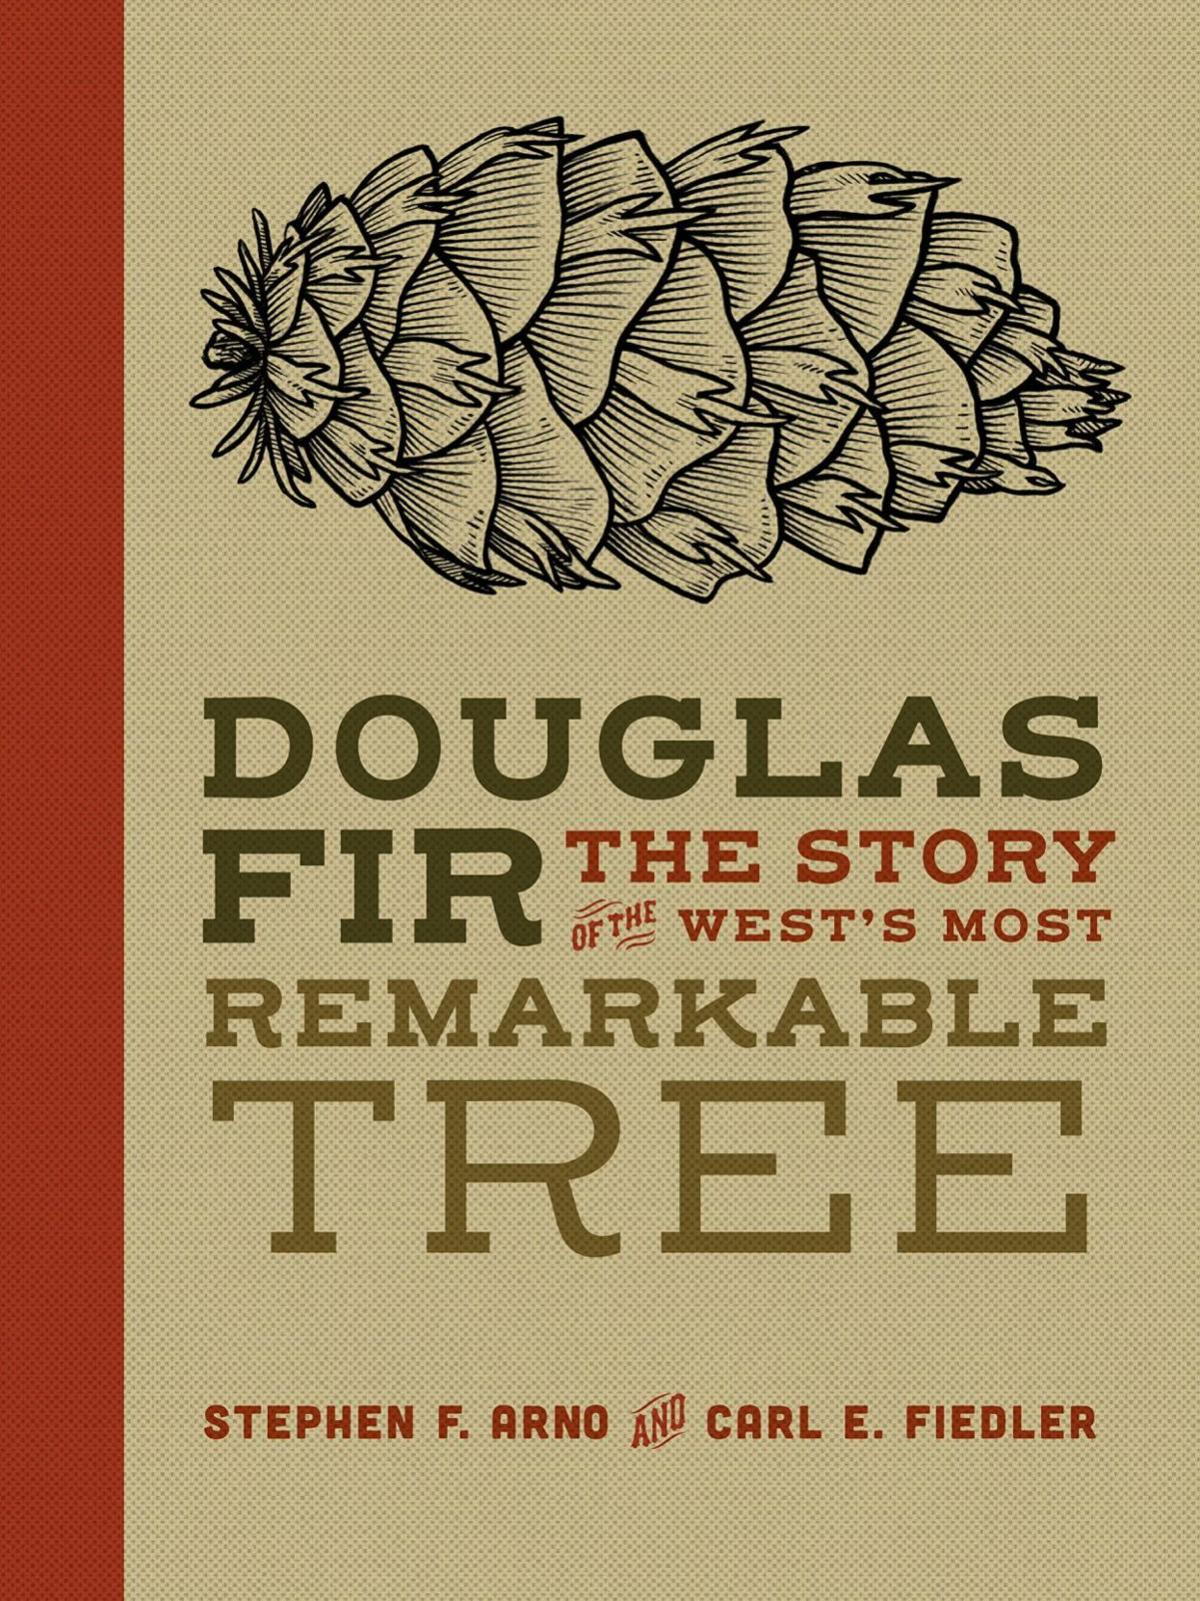 douglas fir book cover